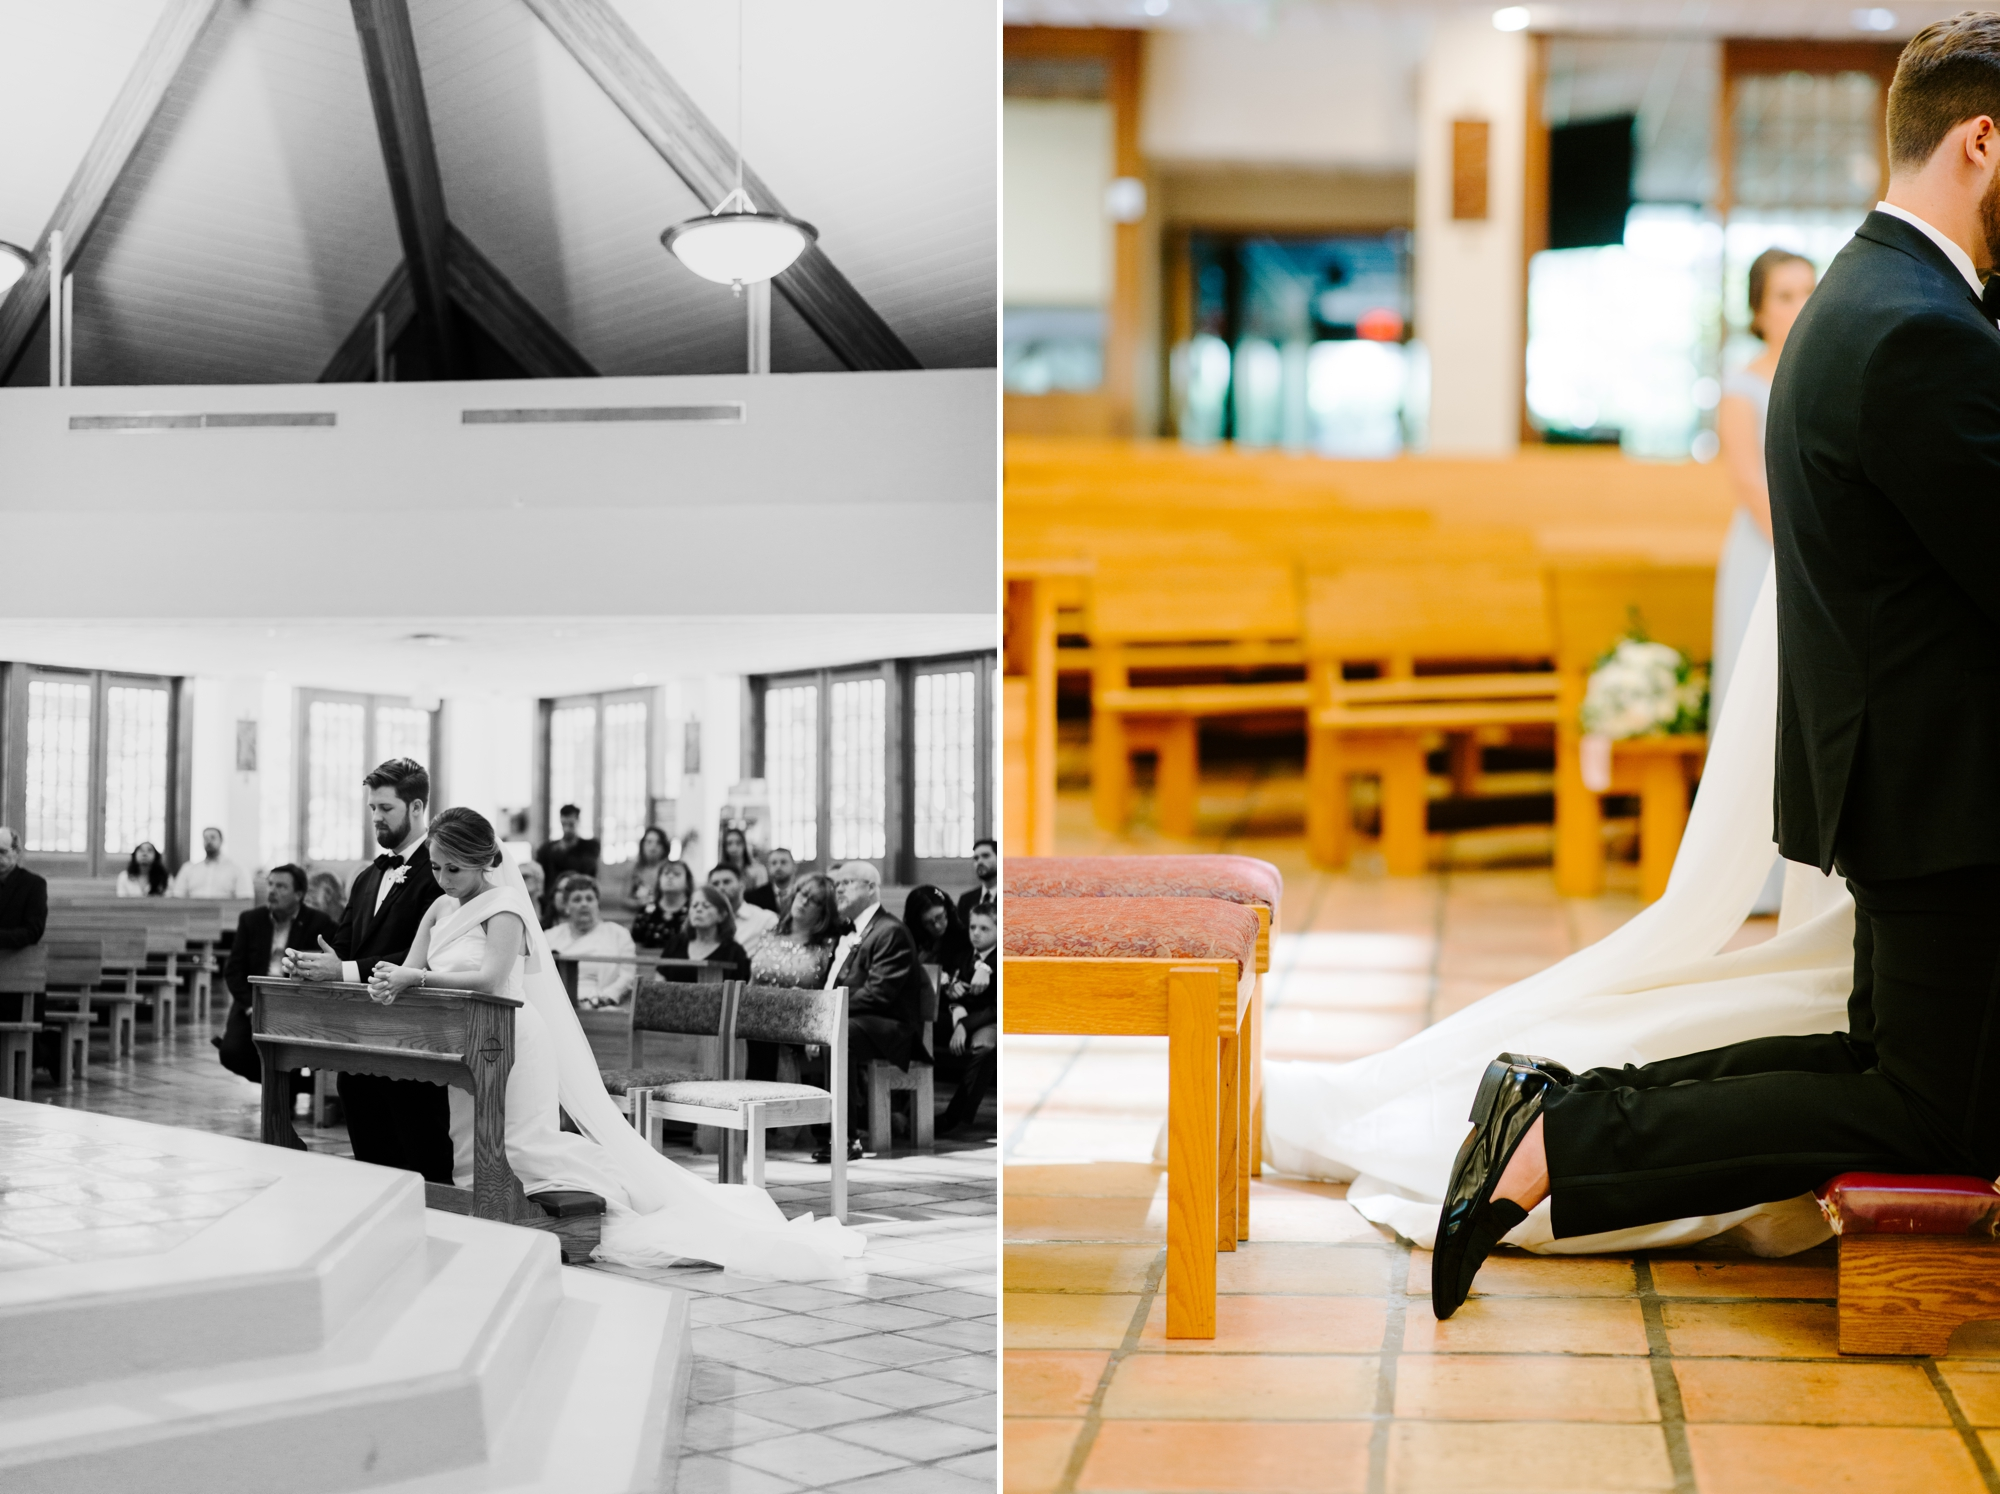 praying bride and groom